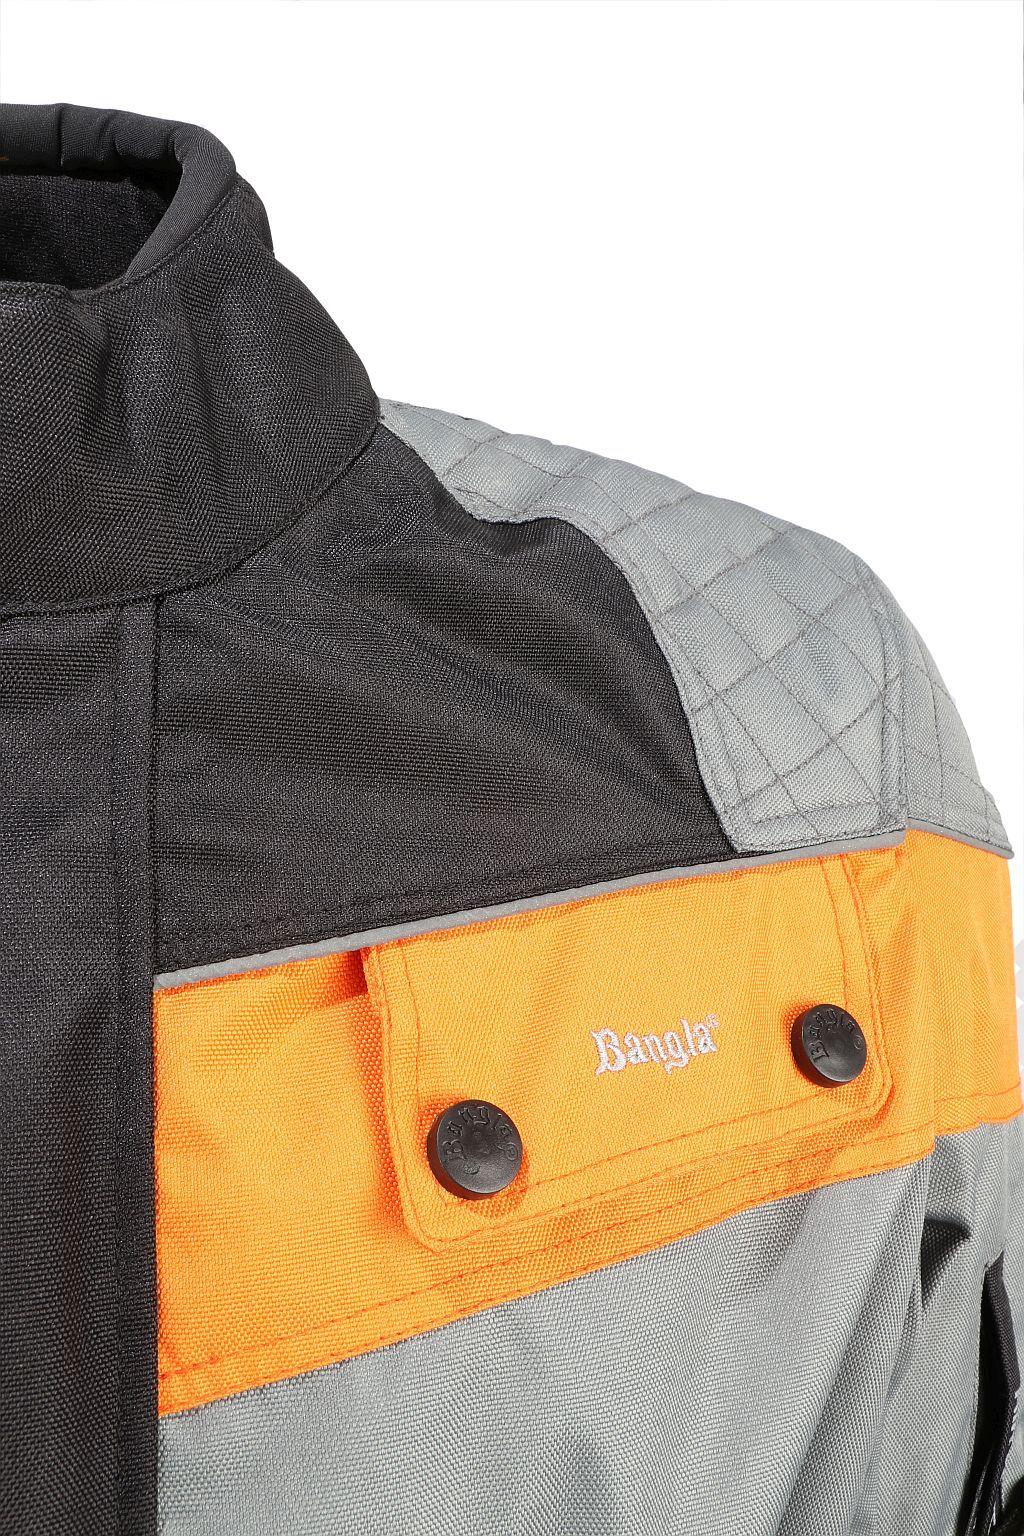 Kinder Motorrad Textil Jacke Cordura schwarz orange grau Motorradjacke 128 - 176